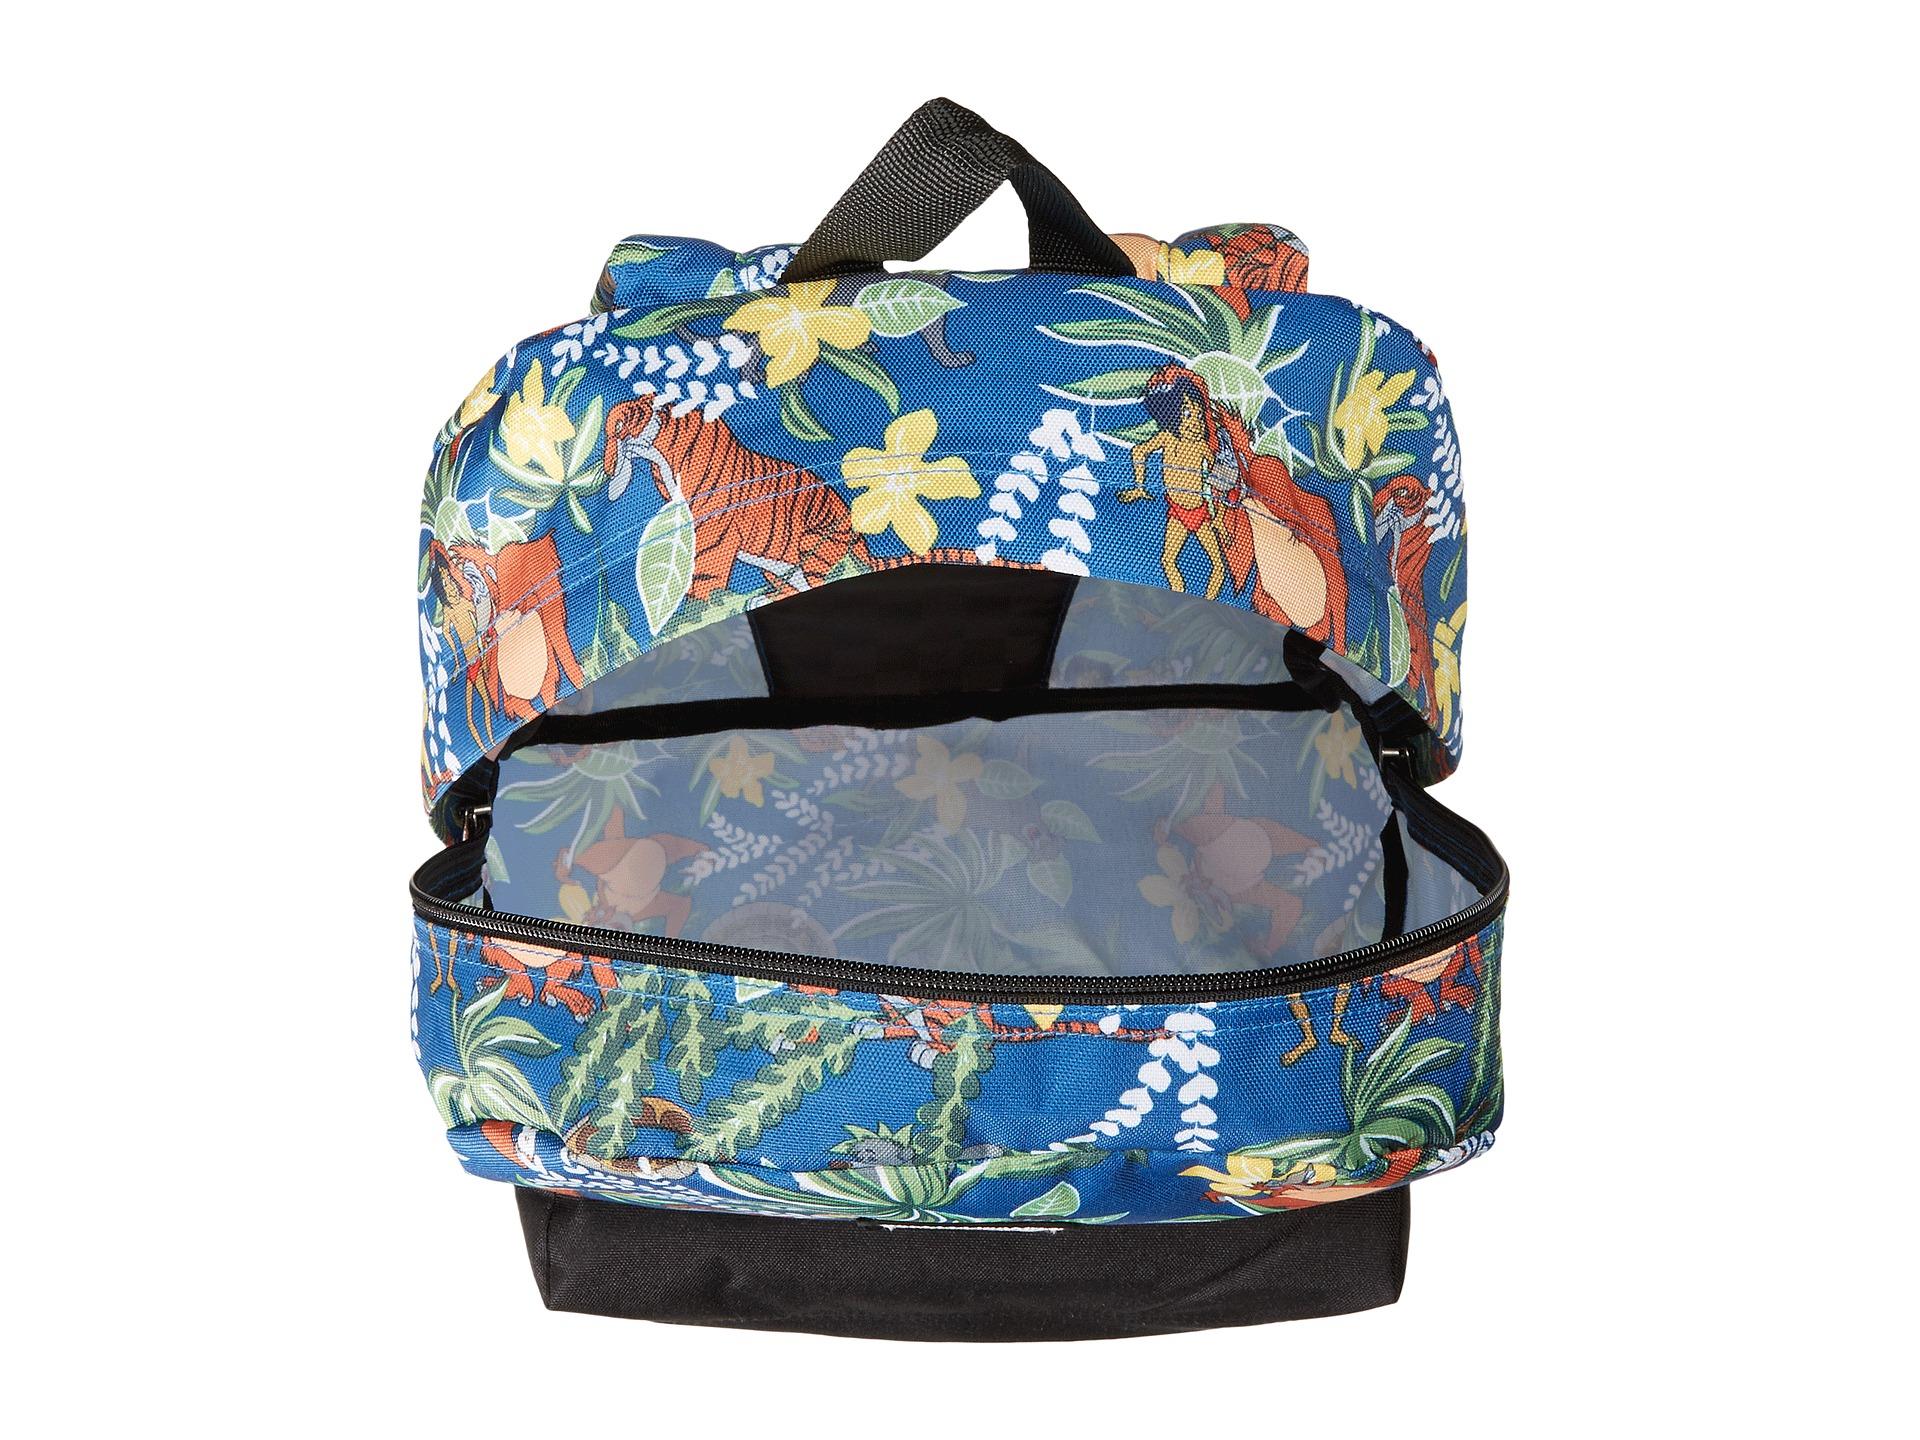 7306863083 Vans Old Skool Ii Backpack The Jungle Book, Vans on PopScreen